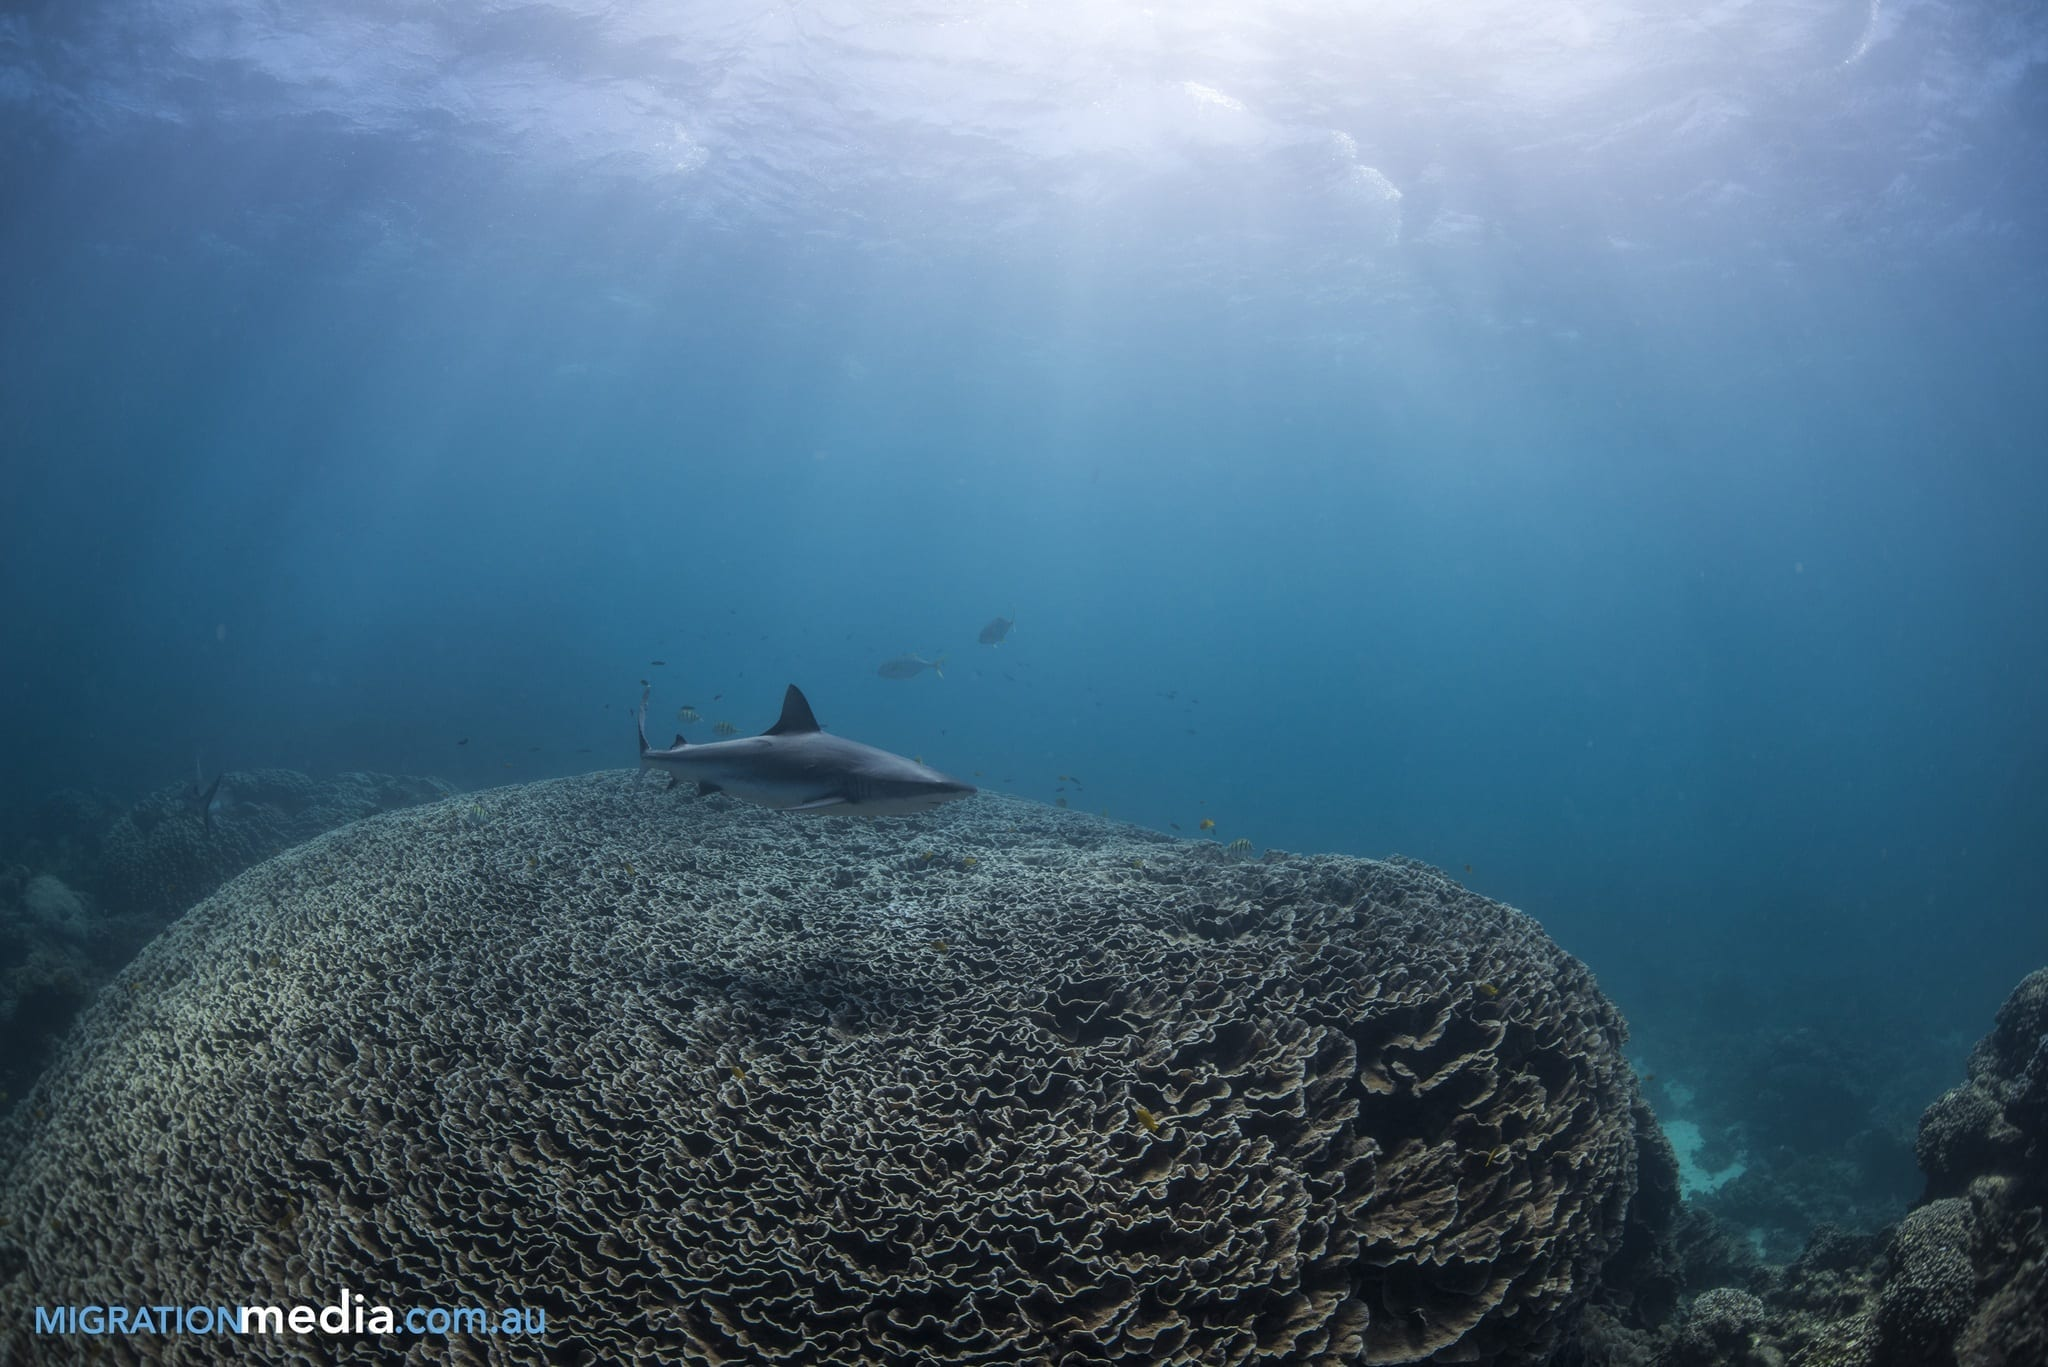 Shark at Ningaloo Reef